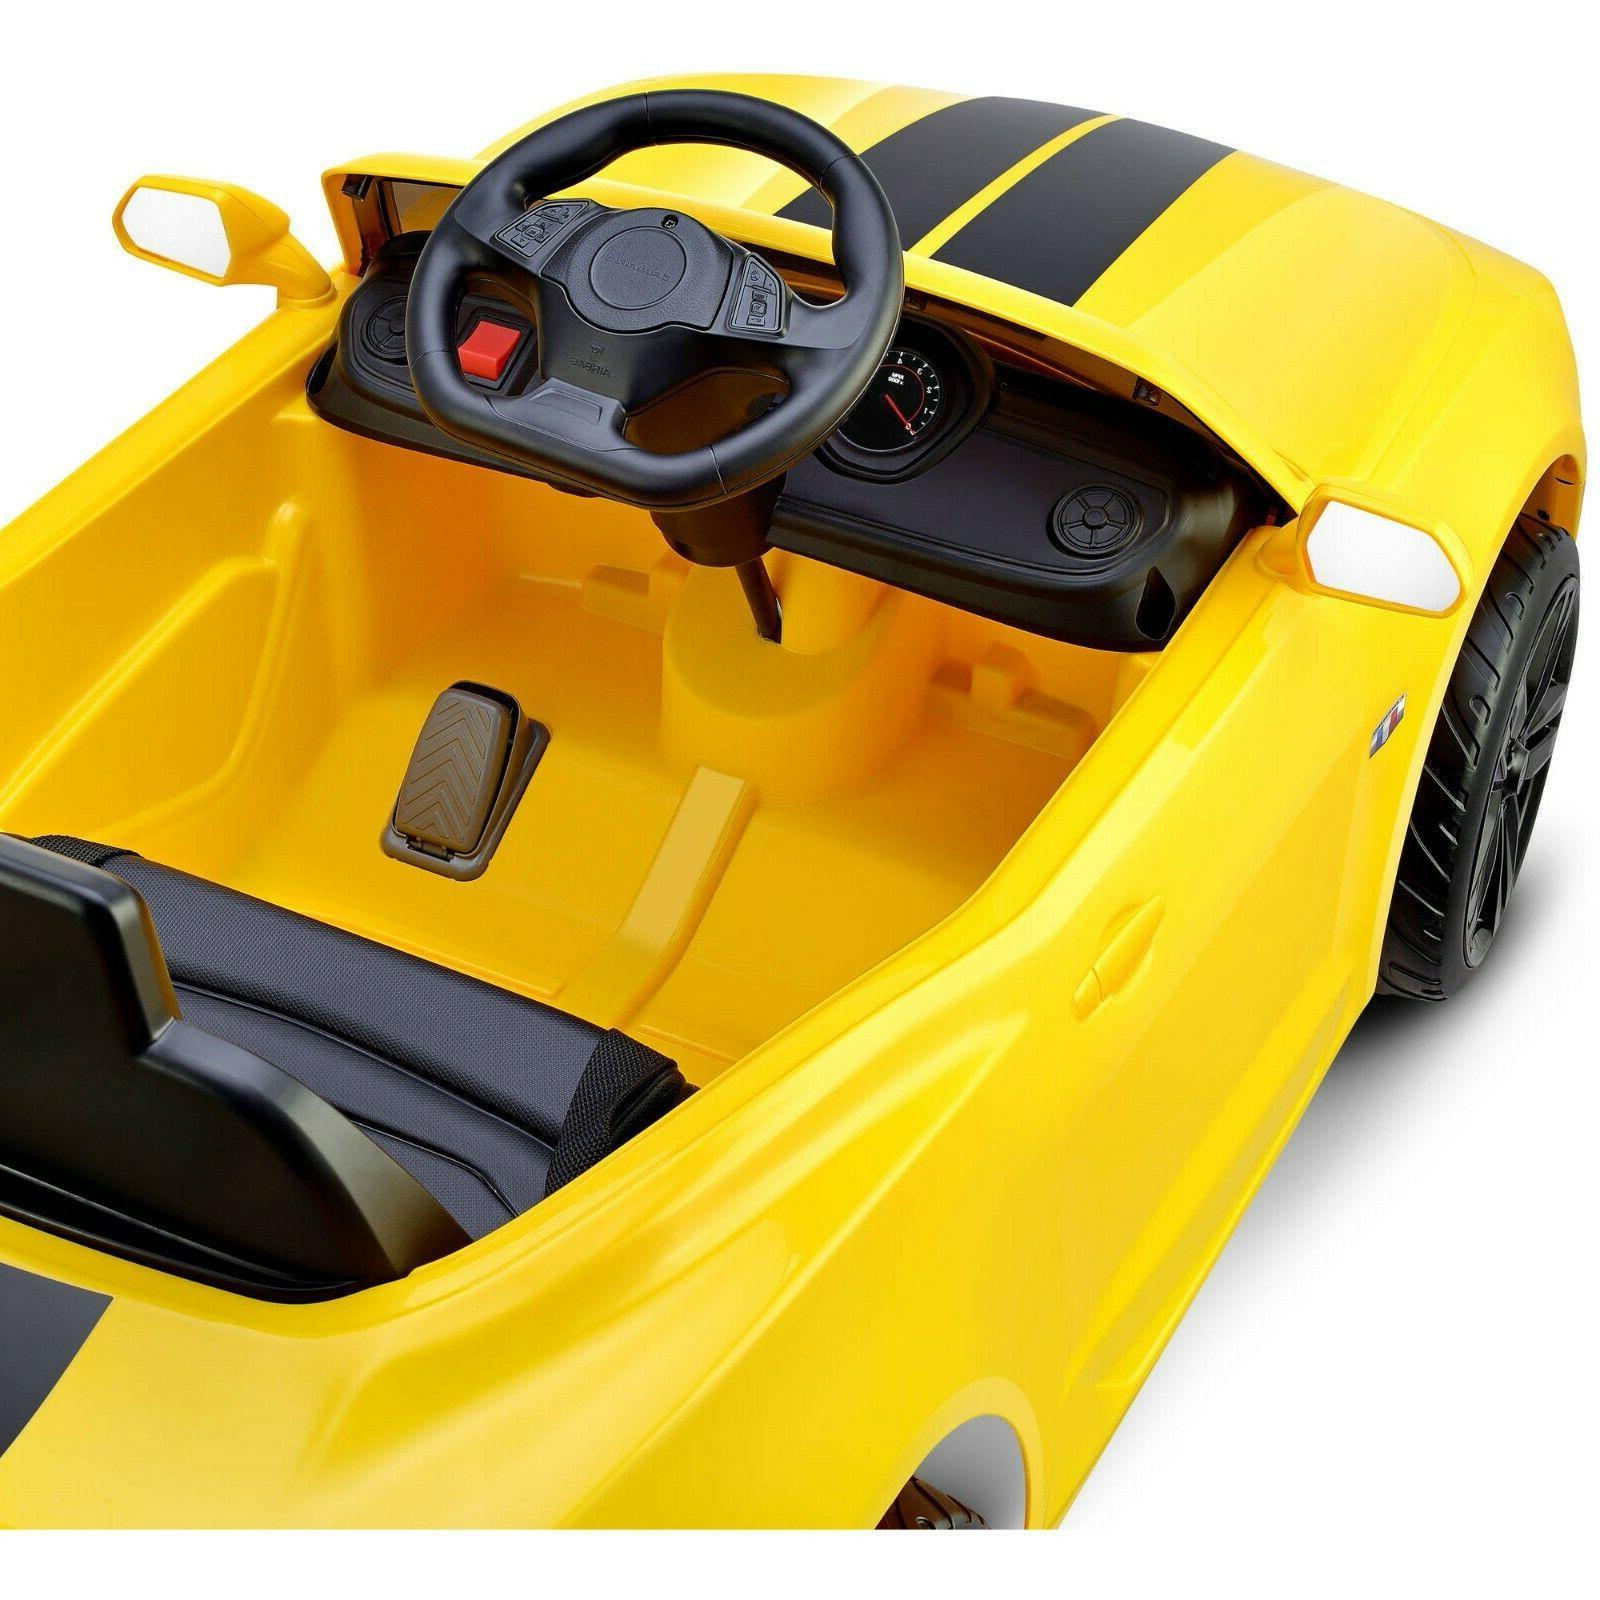 Motorized Cars Kids V6 Ride On Powered